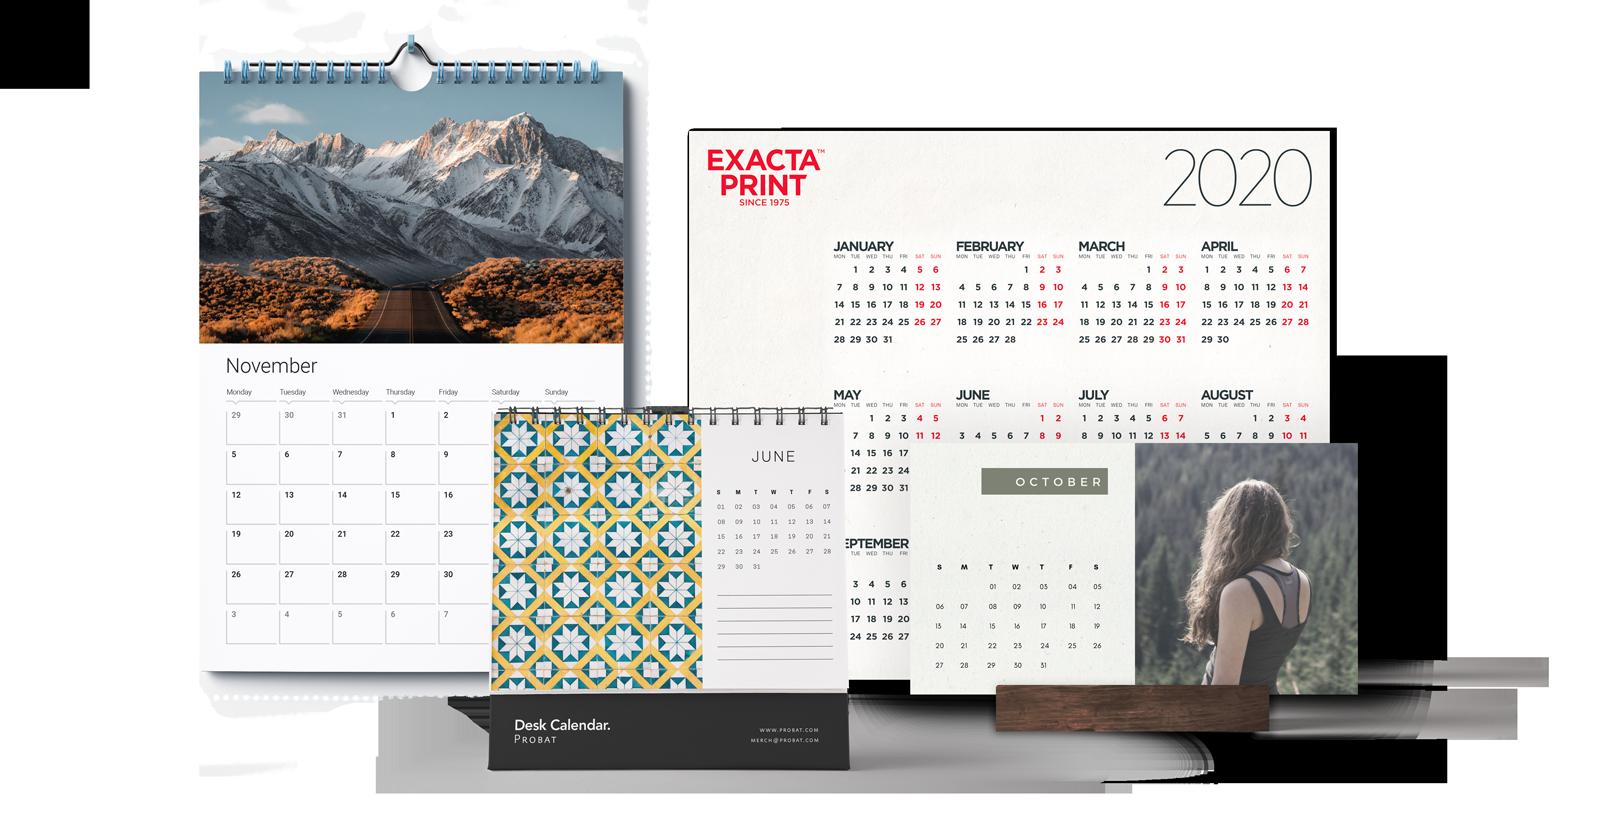 Exacta Print - Selected calendars